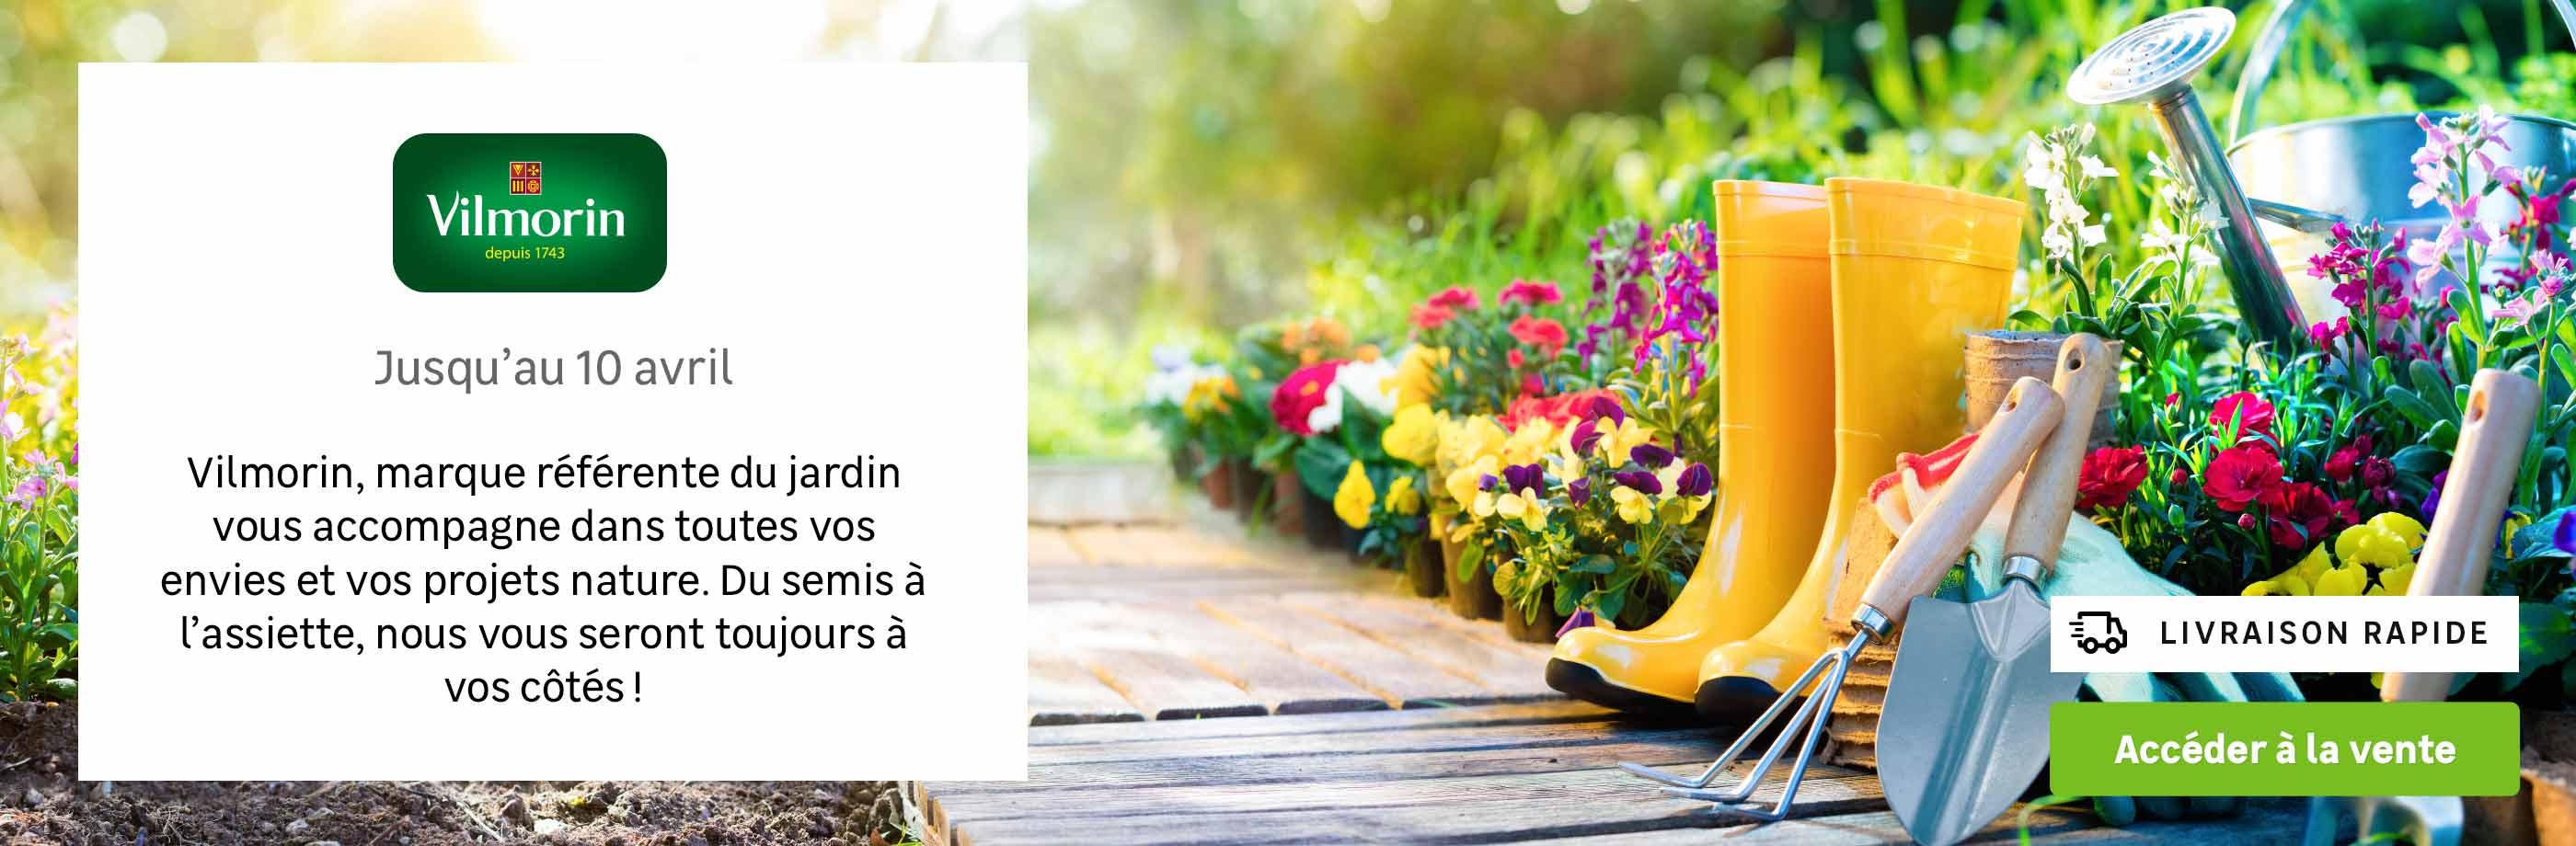 vente privee outillage makita good aspirateur pour dchets secs et humides sans fil v outil seul. Black Bedroom Furniture Sets. Home Design Ideas